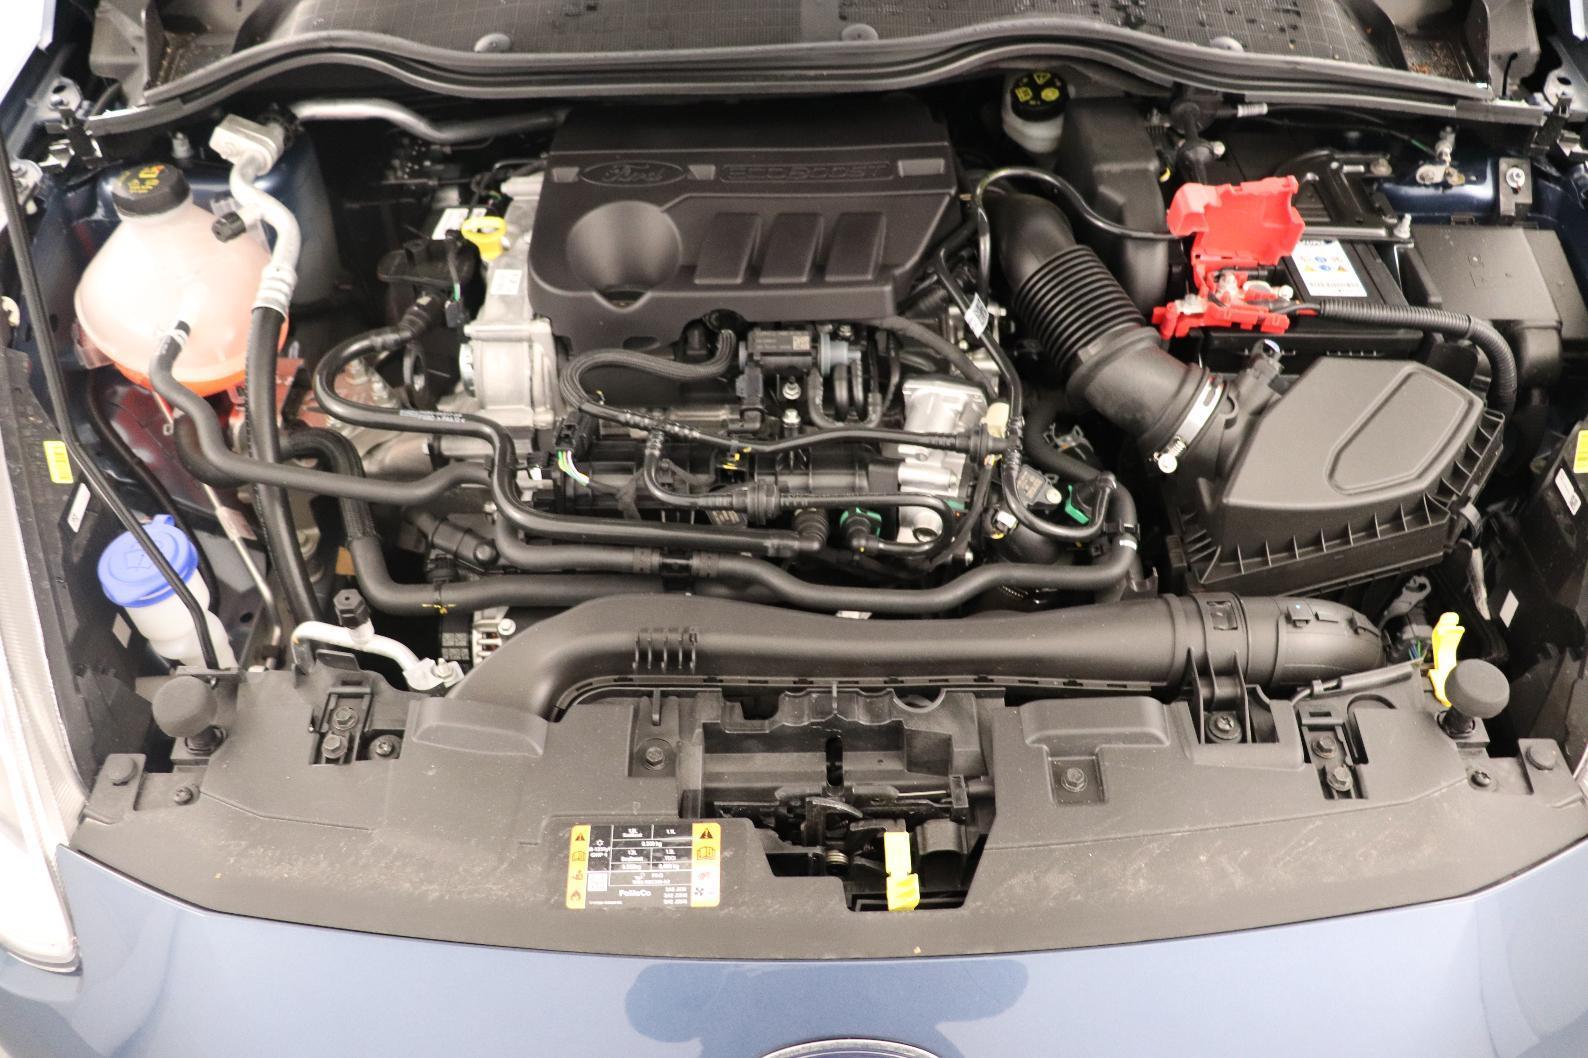 FORD FIESTA 1.0 EcoBoost 125 ch S&S mHEV BVM6 Titanium